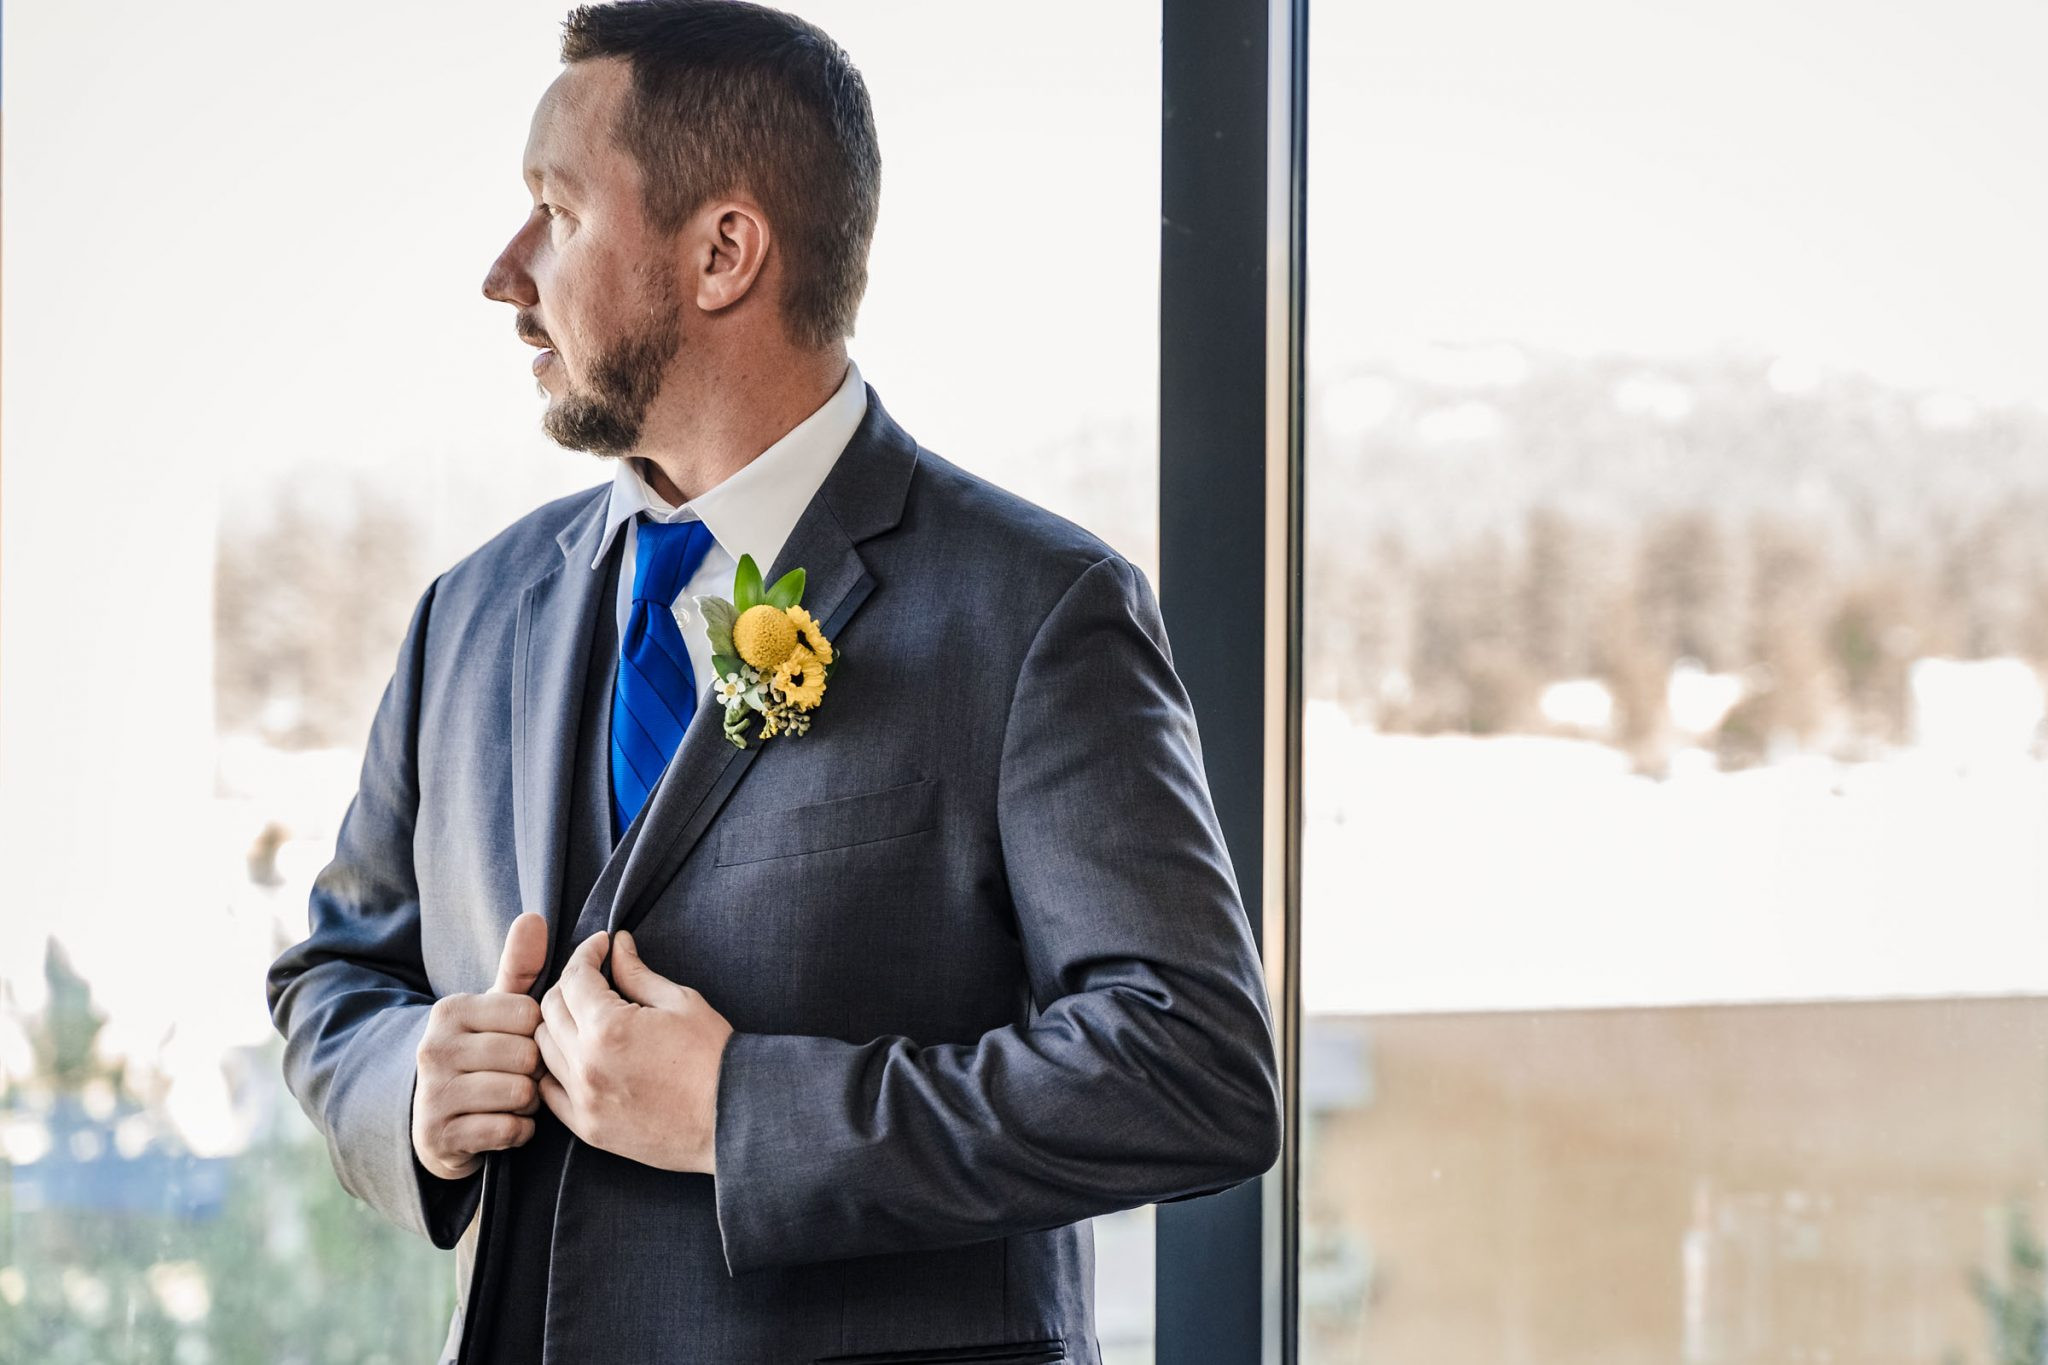 Groom getting ready at Harveys Harrahs wedding in South Lake Tahoe